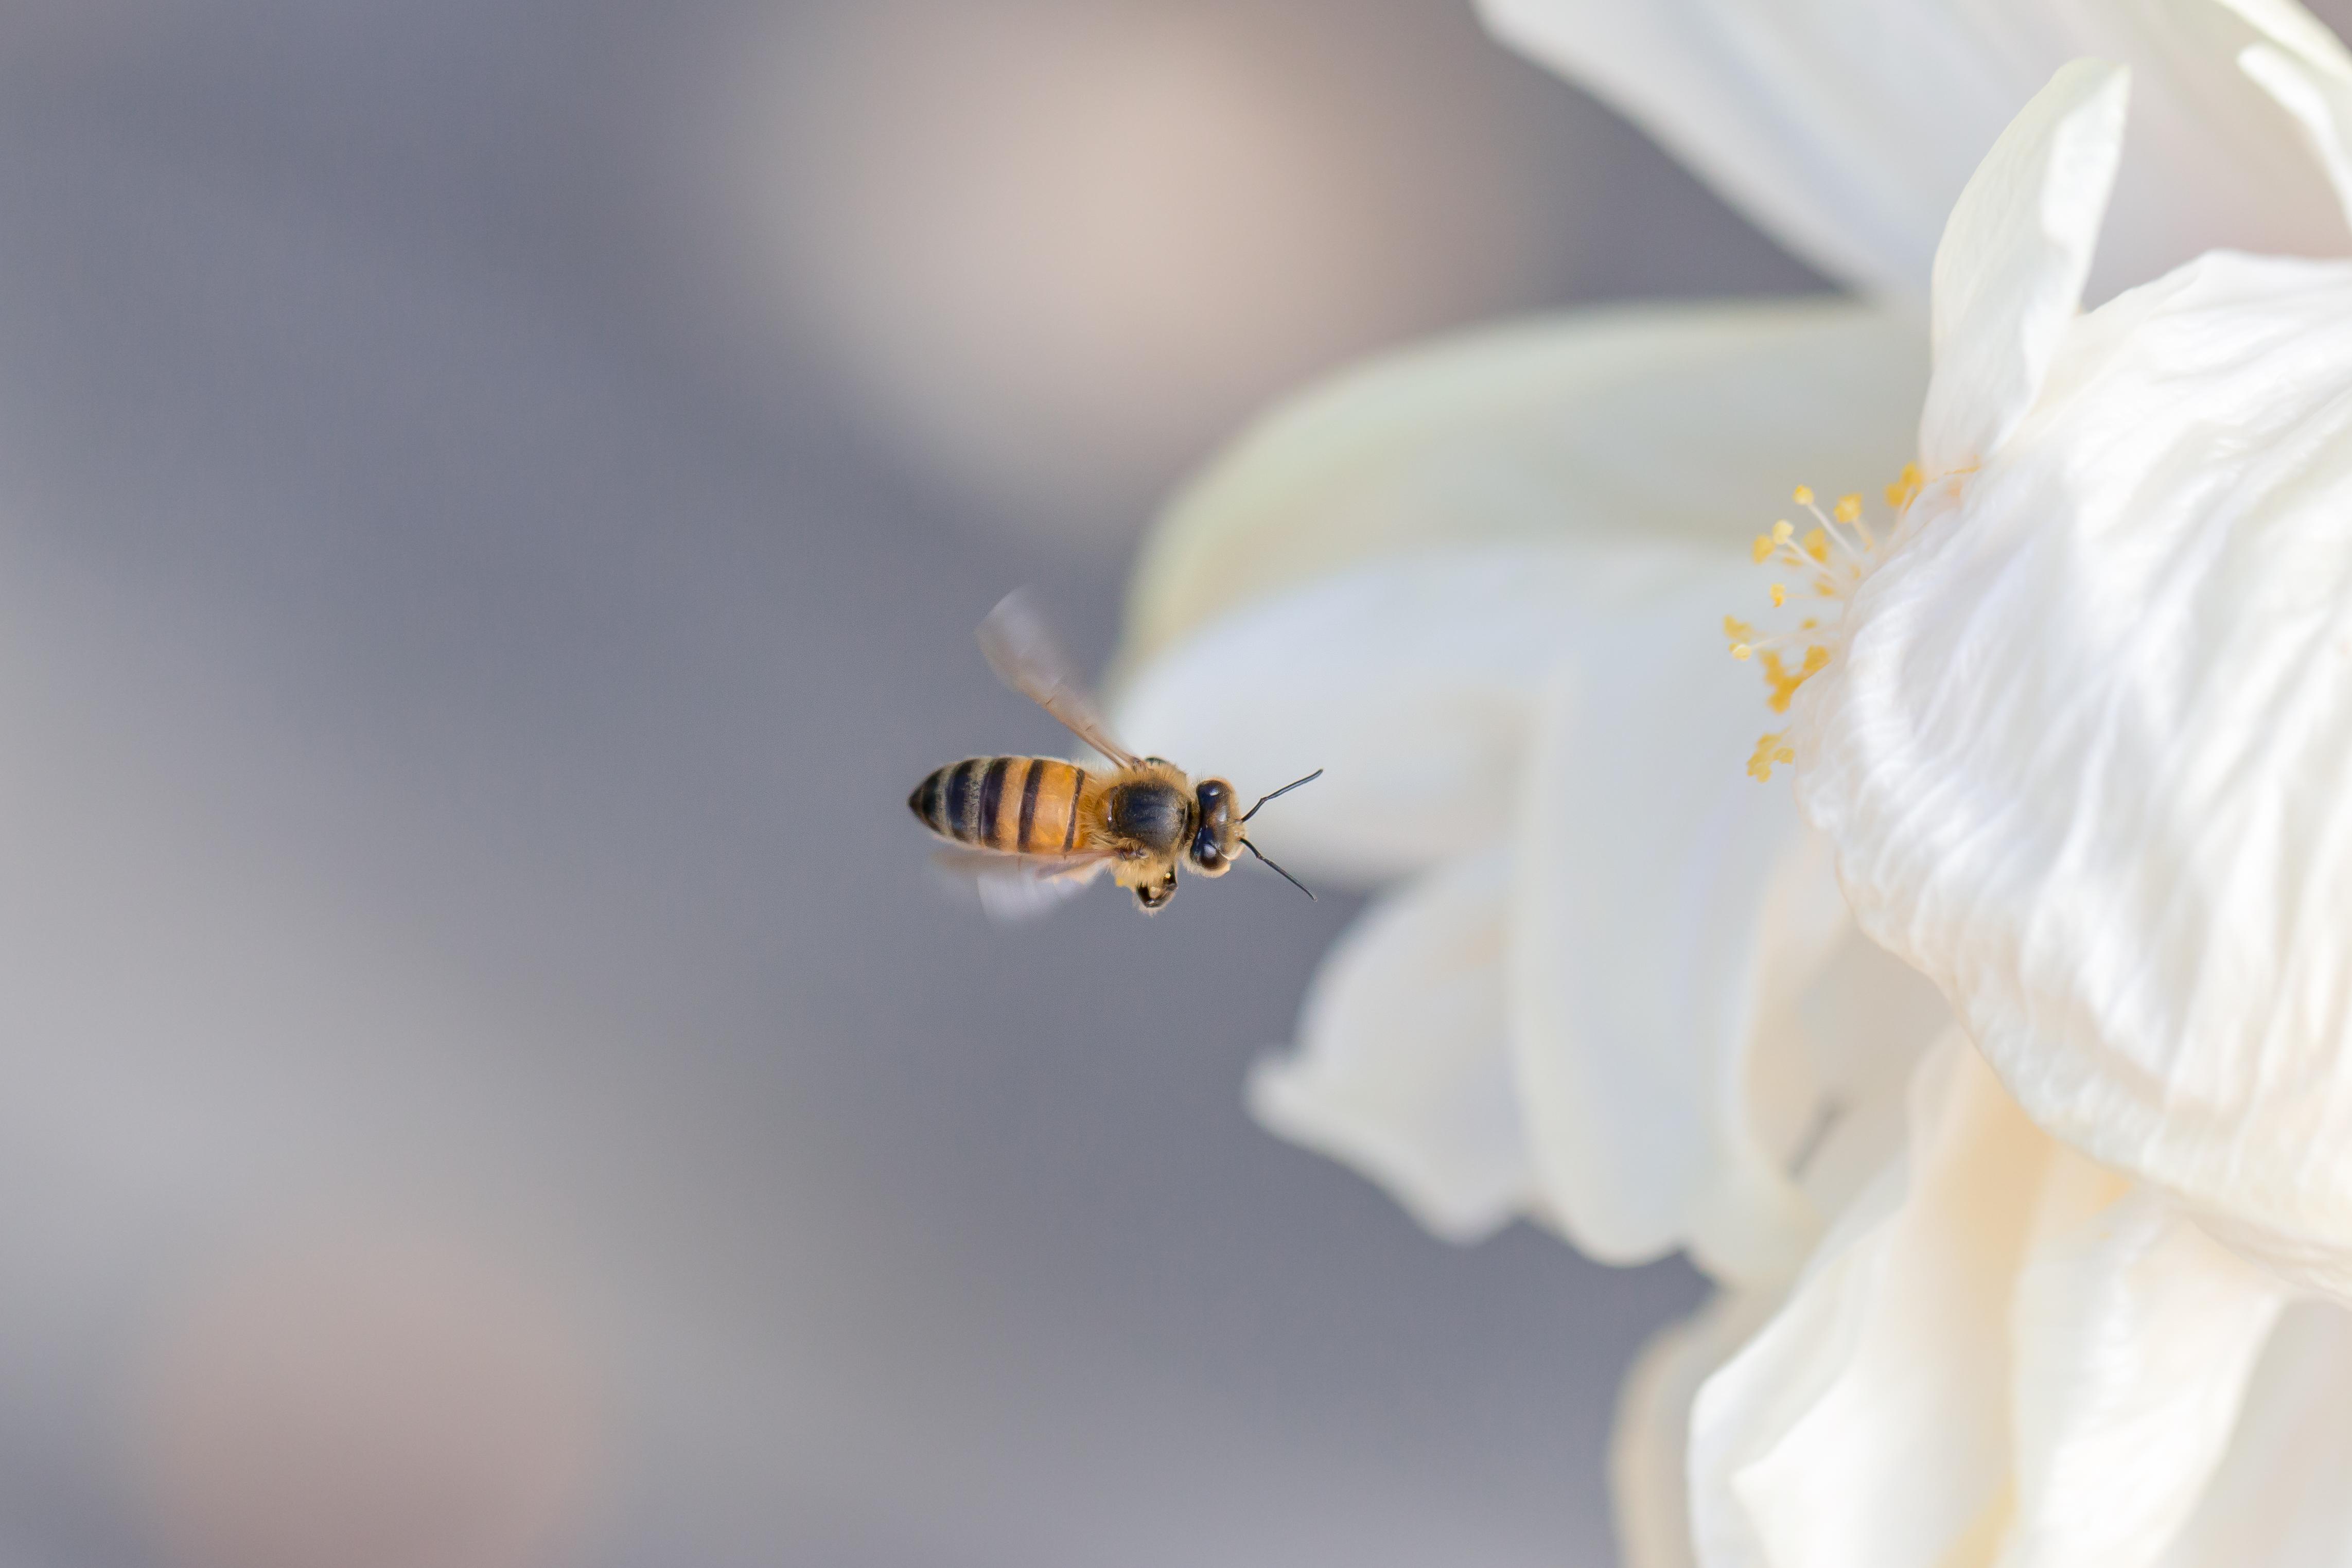 A dos d'abeille